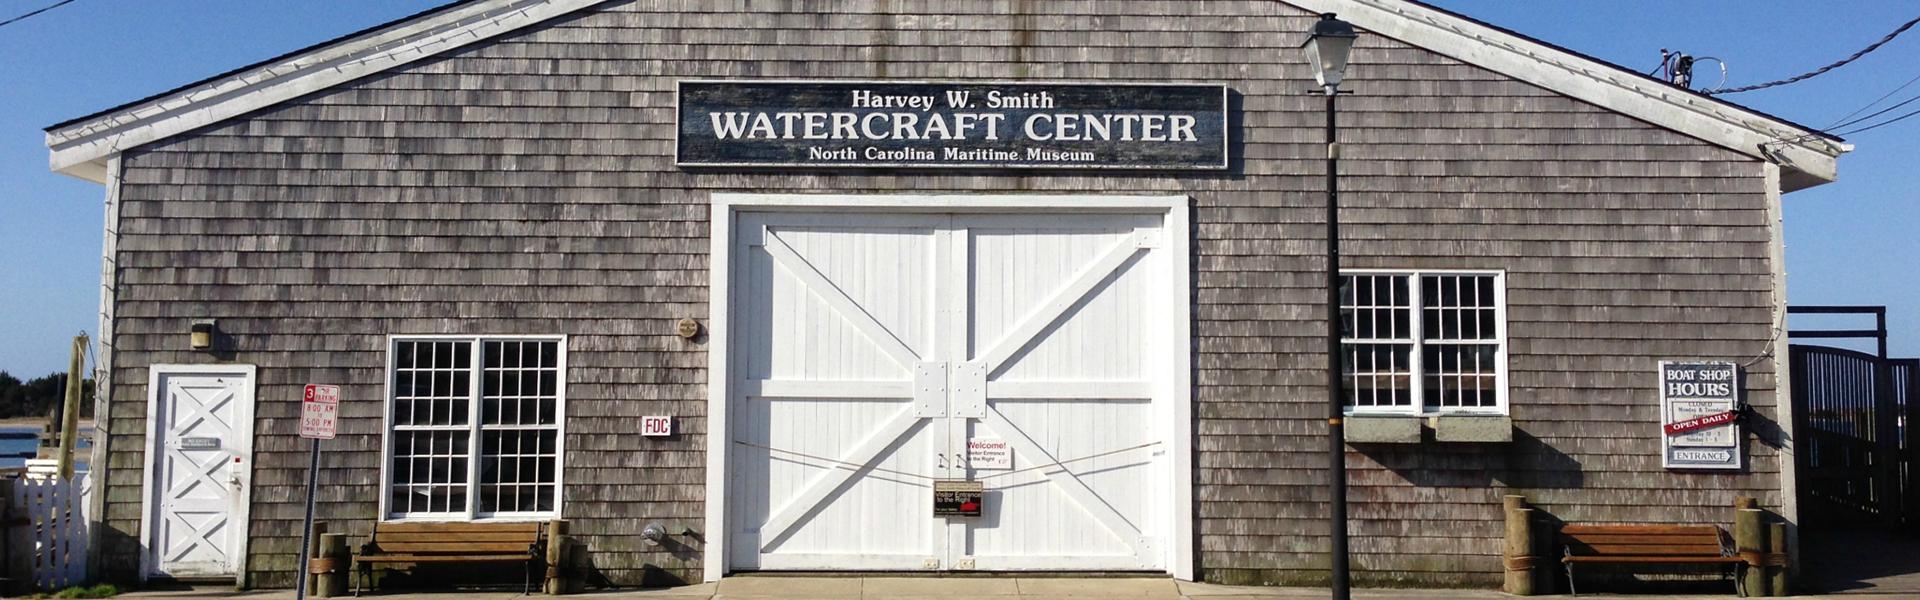 2016-WatercraftCenter-LayerSlider-1